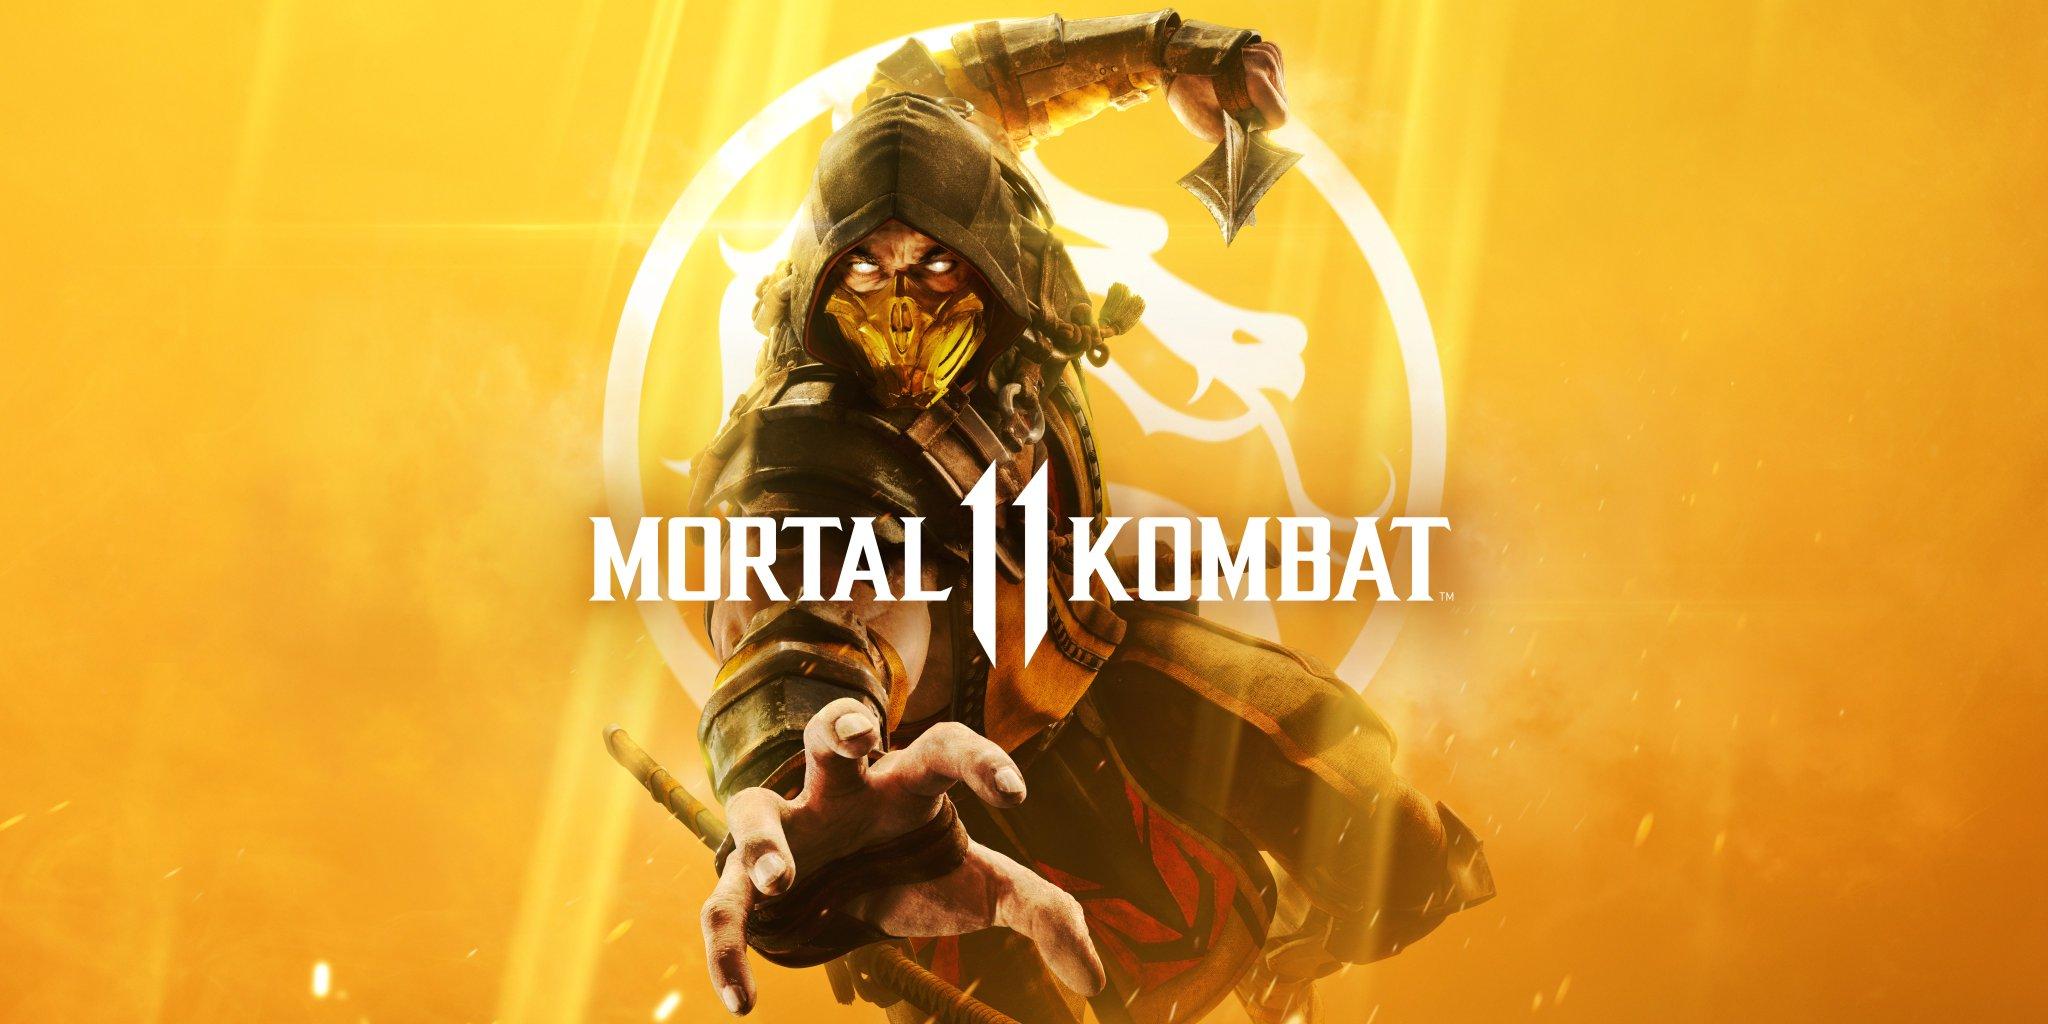 Mortal Kombat 11 launch trailer brings back the classic theme